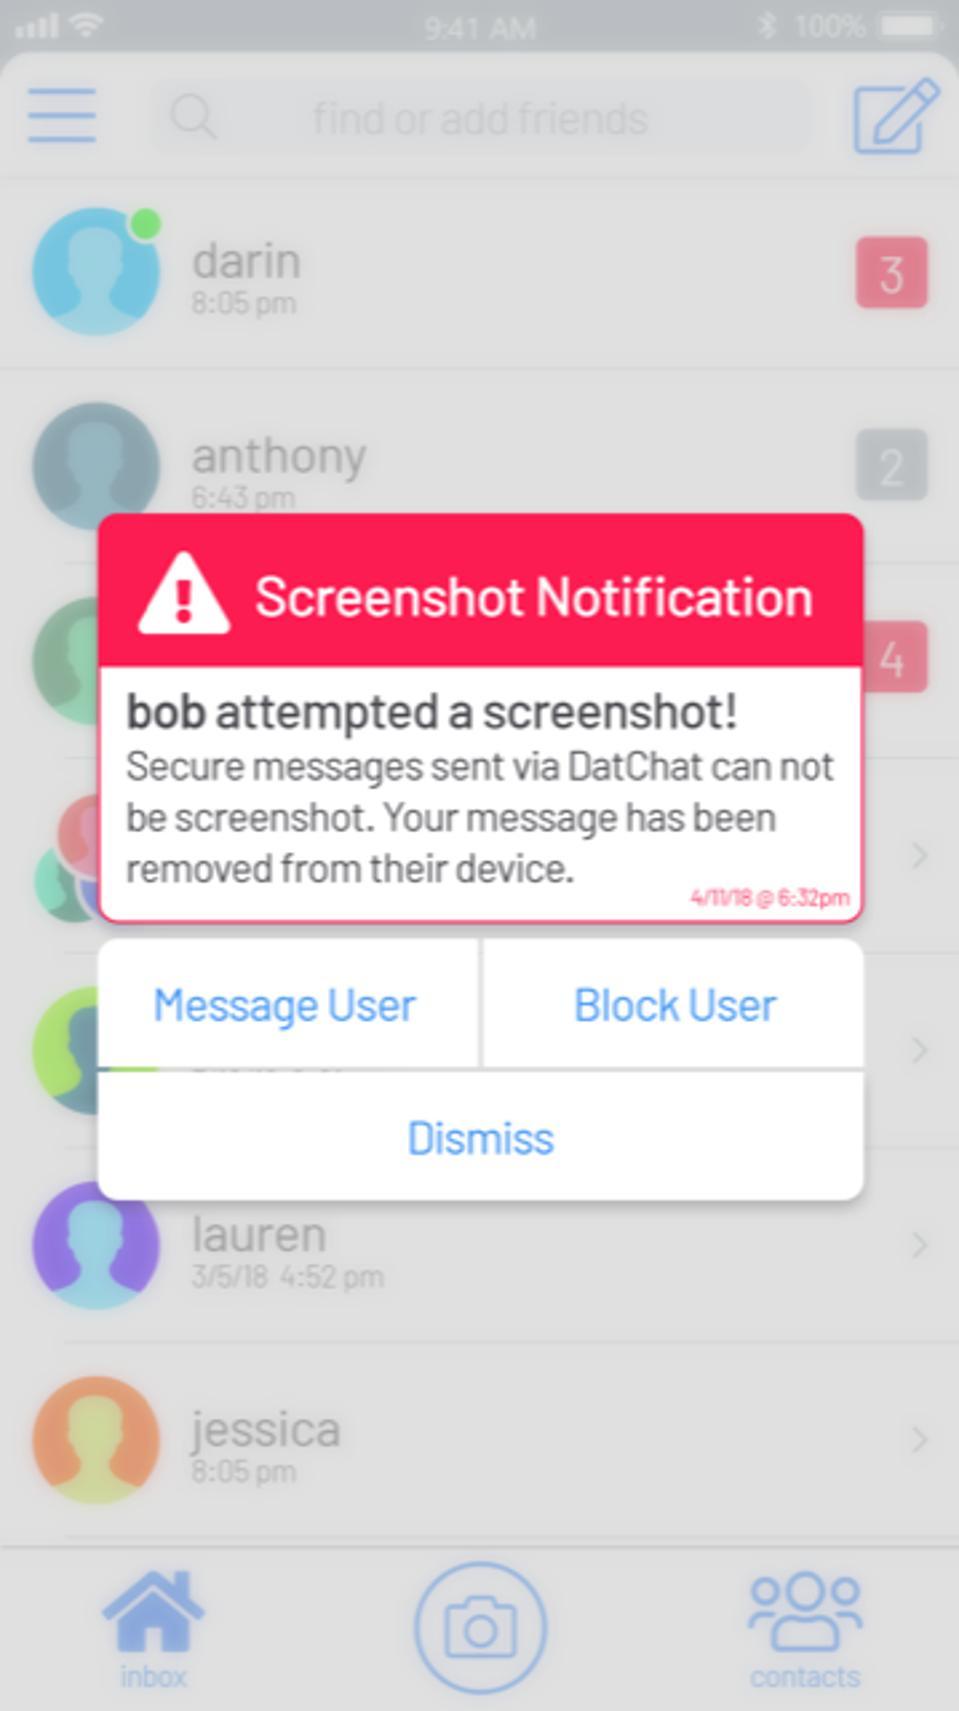 Screenshot Notification